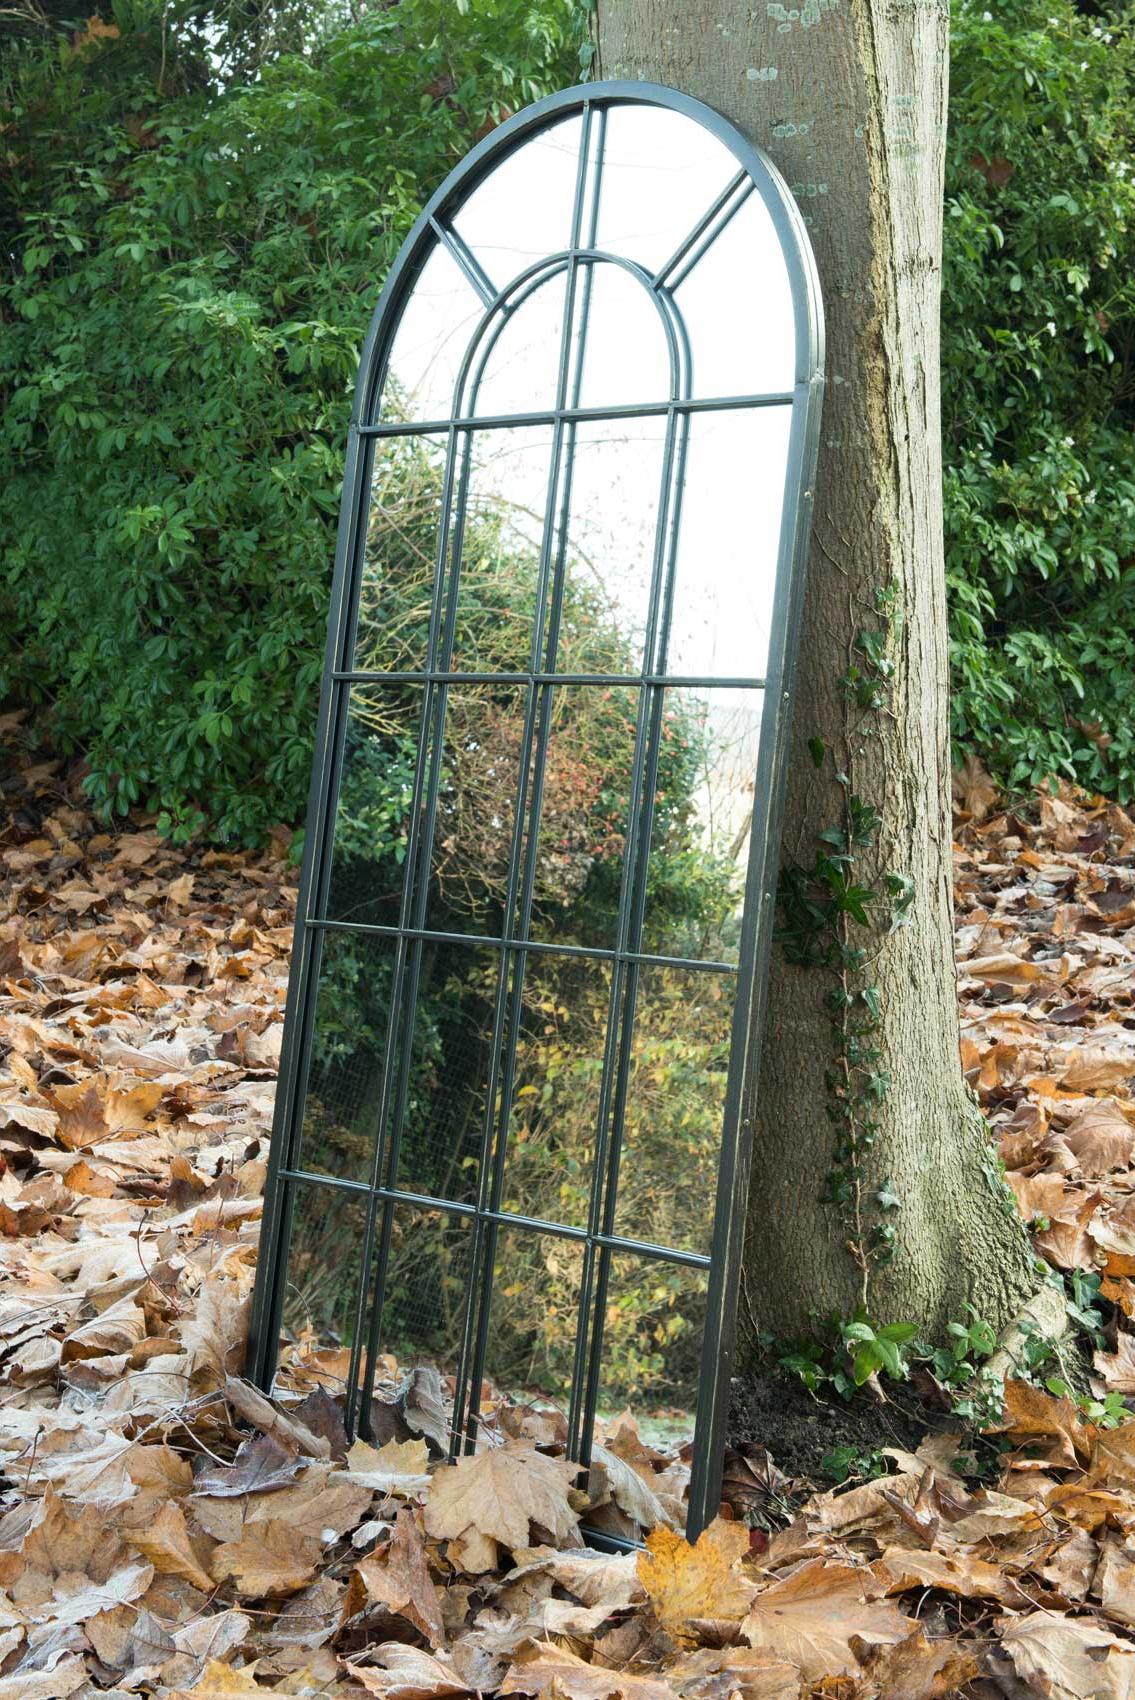 Honiton Black Victorian Indoor Outdoor Garden Wall Mirror 140X65 Cm Regarding Latest Outdoor Garden Wall Mirrors (Gallery 12 of 20)